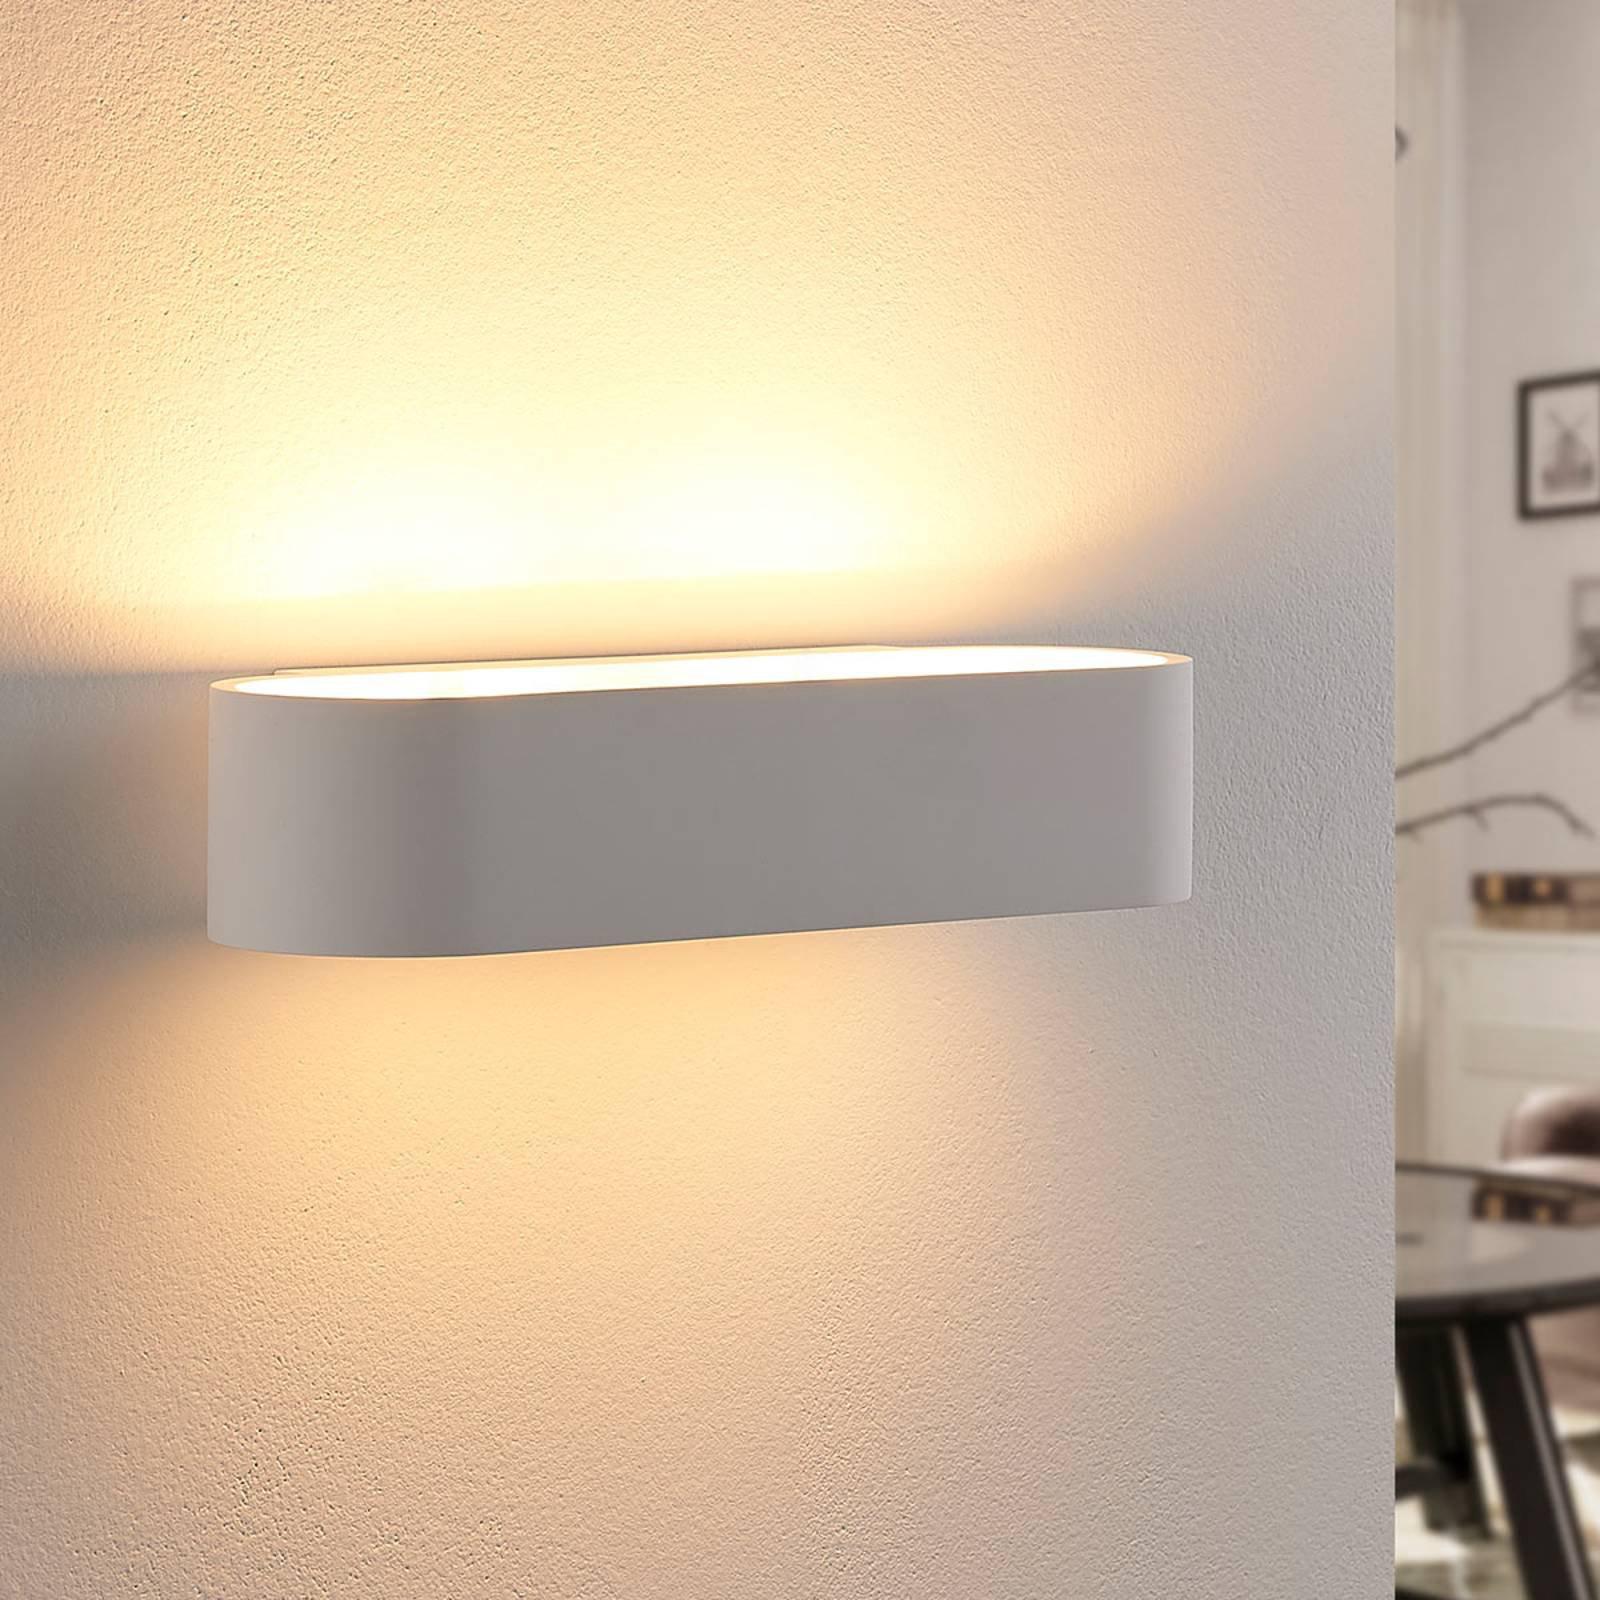 Avrundet vegglampe Fioni i gips, LED